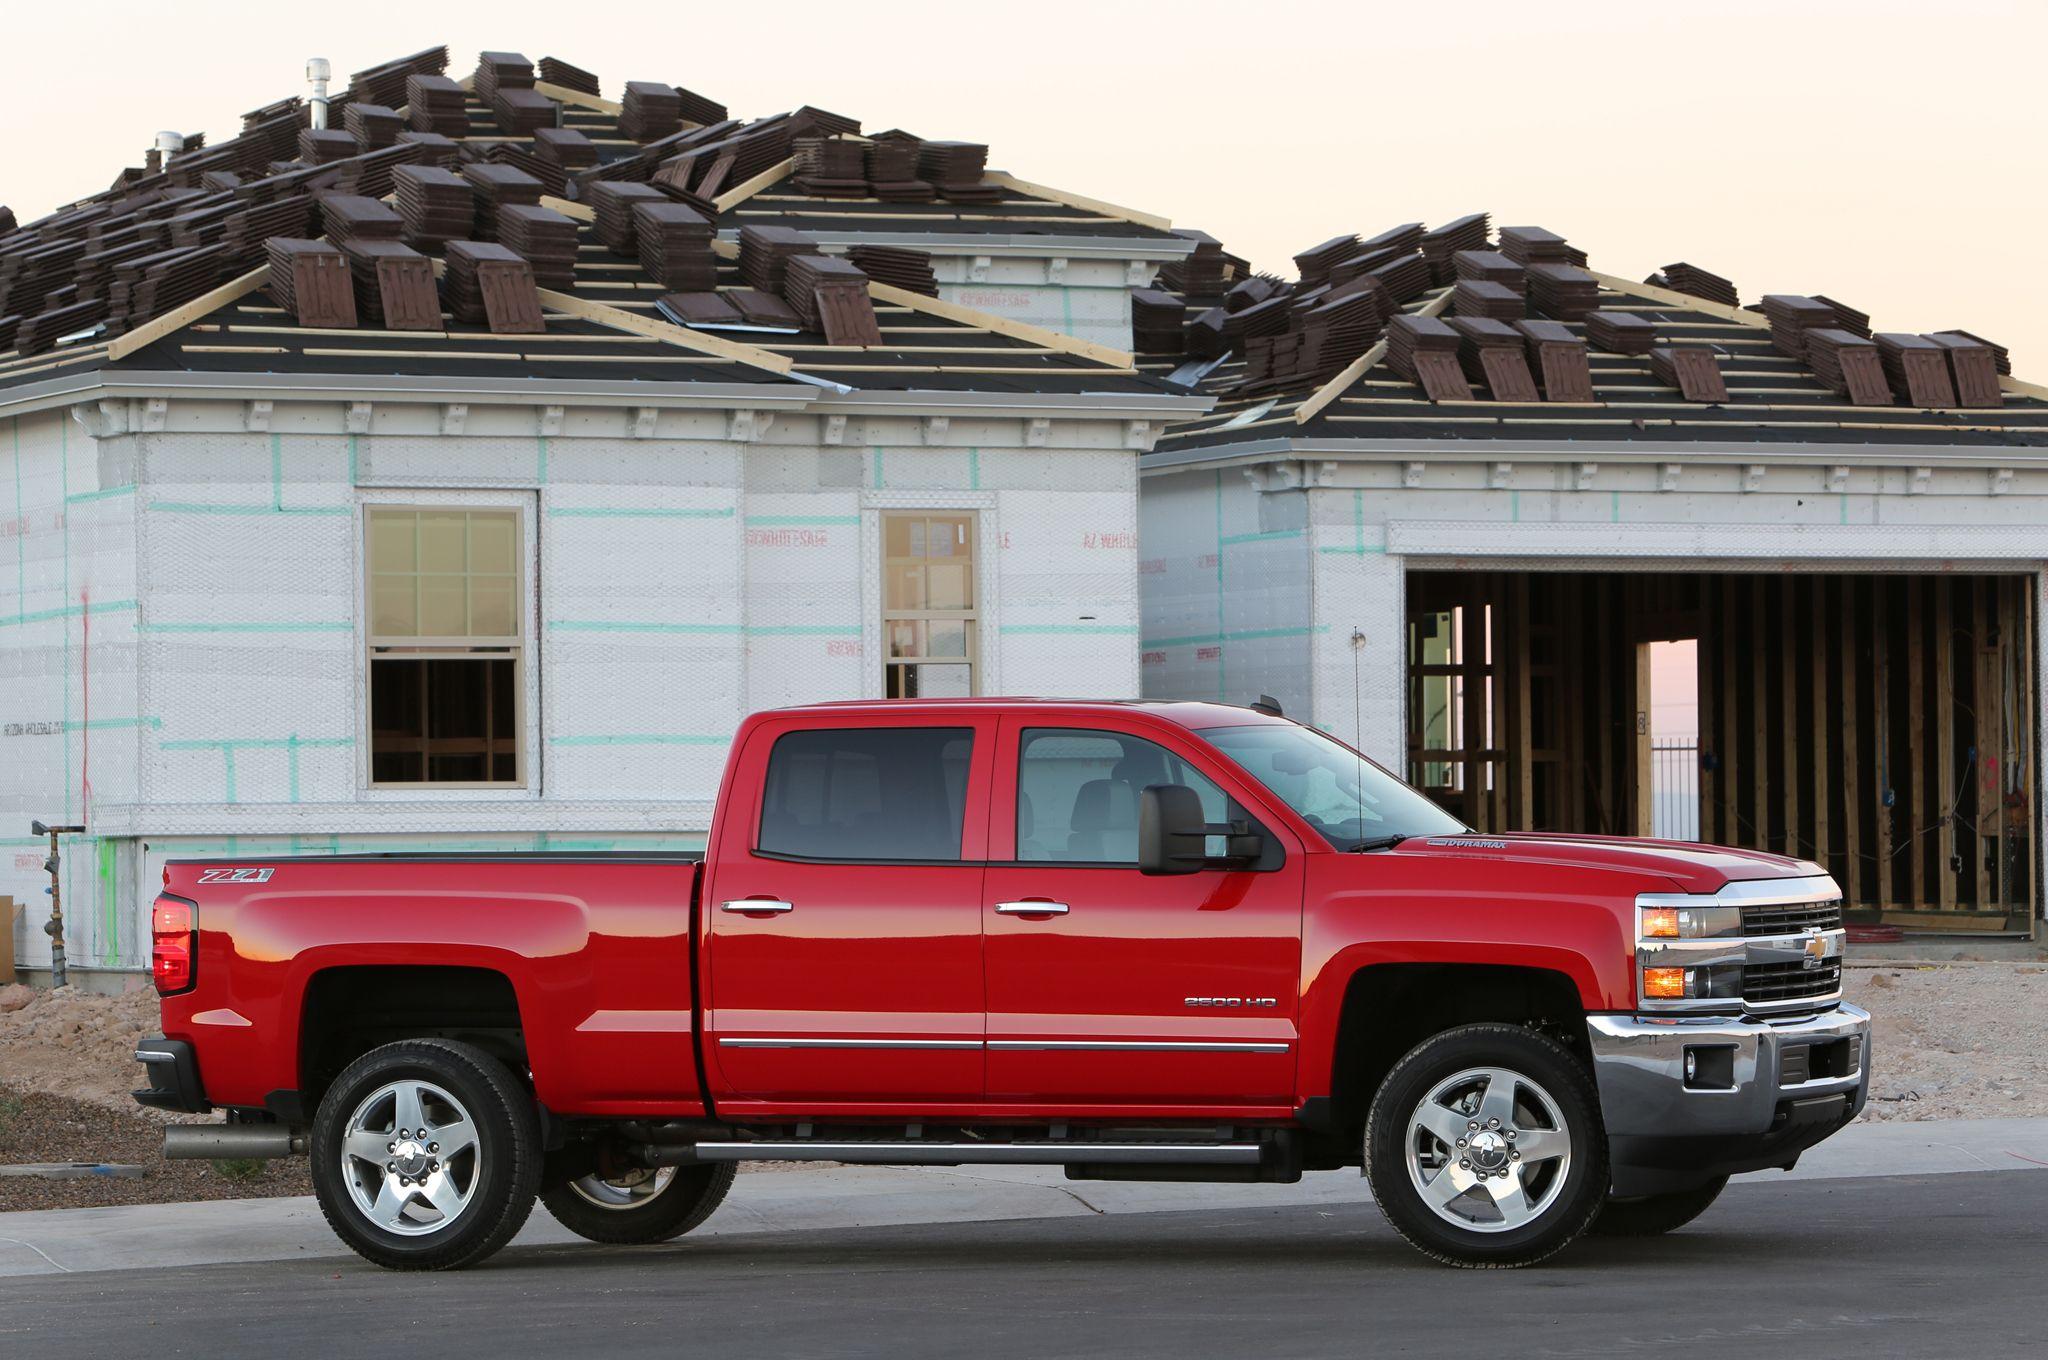 2015 2500hd chevrolet duramax z71 crew cab red 4x4 cars trucks pinterest 4x4 chevrolet and cars